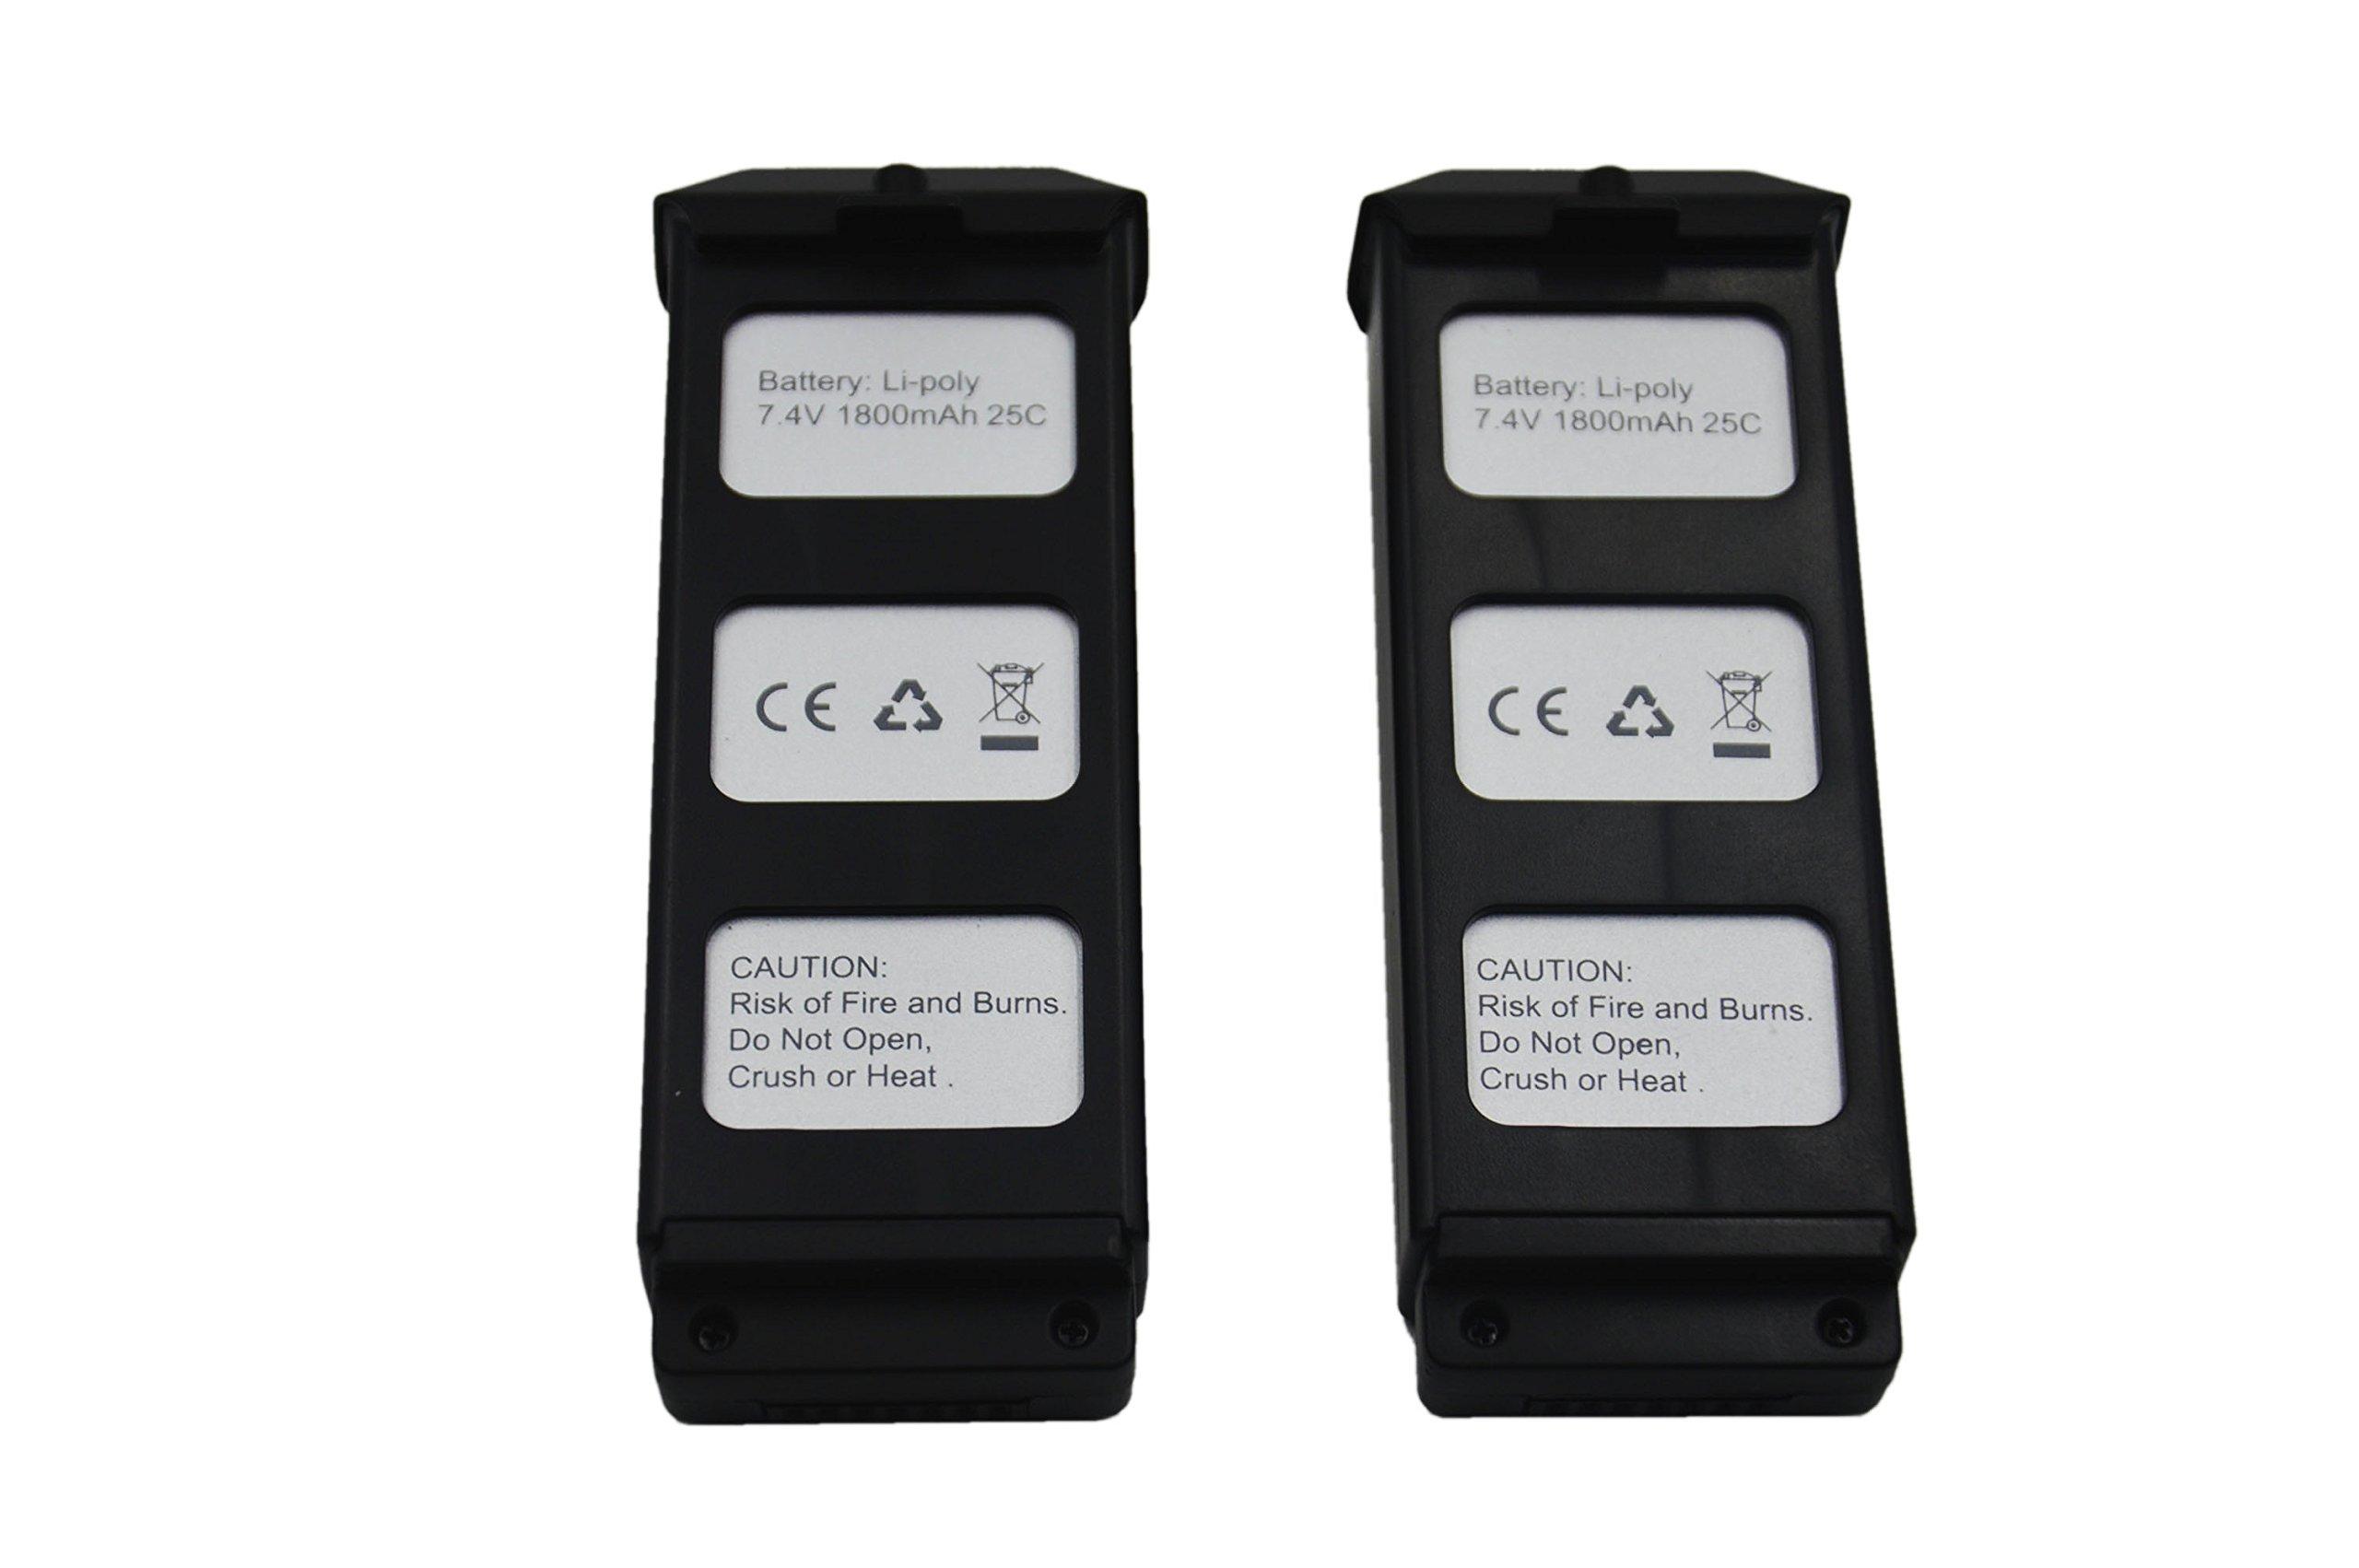 Harga Dan Spesifikasi Drone Mjx Bugs 5w B5w Dual Gps Terbaru Baterai Laptop Notebook Hp Compaq Presario Pavilion 2000 430 431 435 436 630 631 635 636 Cq32 Cq42 Cq43 Cq62 Cq72 Dm4 1000 G4 G32 G42 G42t G62 G62t G72 G72t Blomiky 2 Pack Li Poly 74v 1800mah 25c Battery For